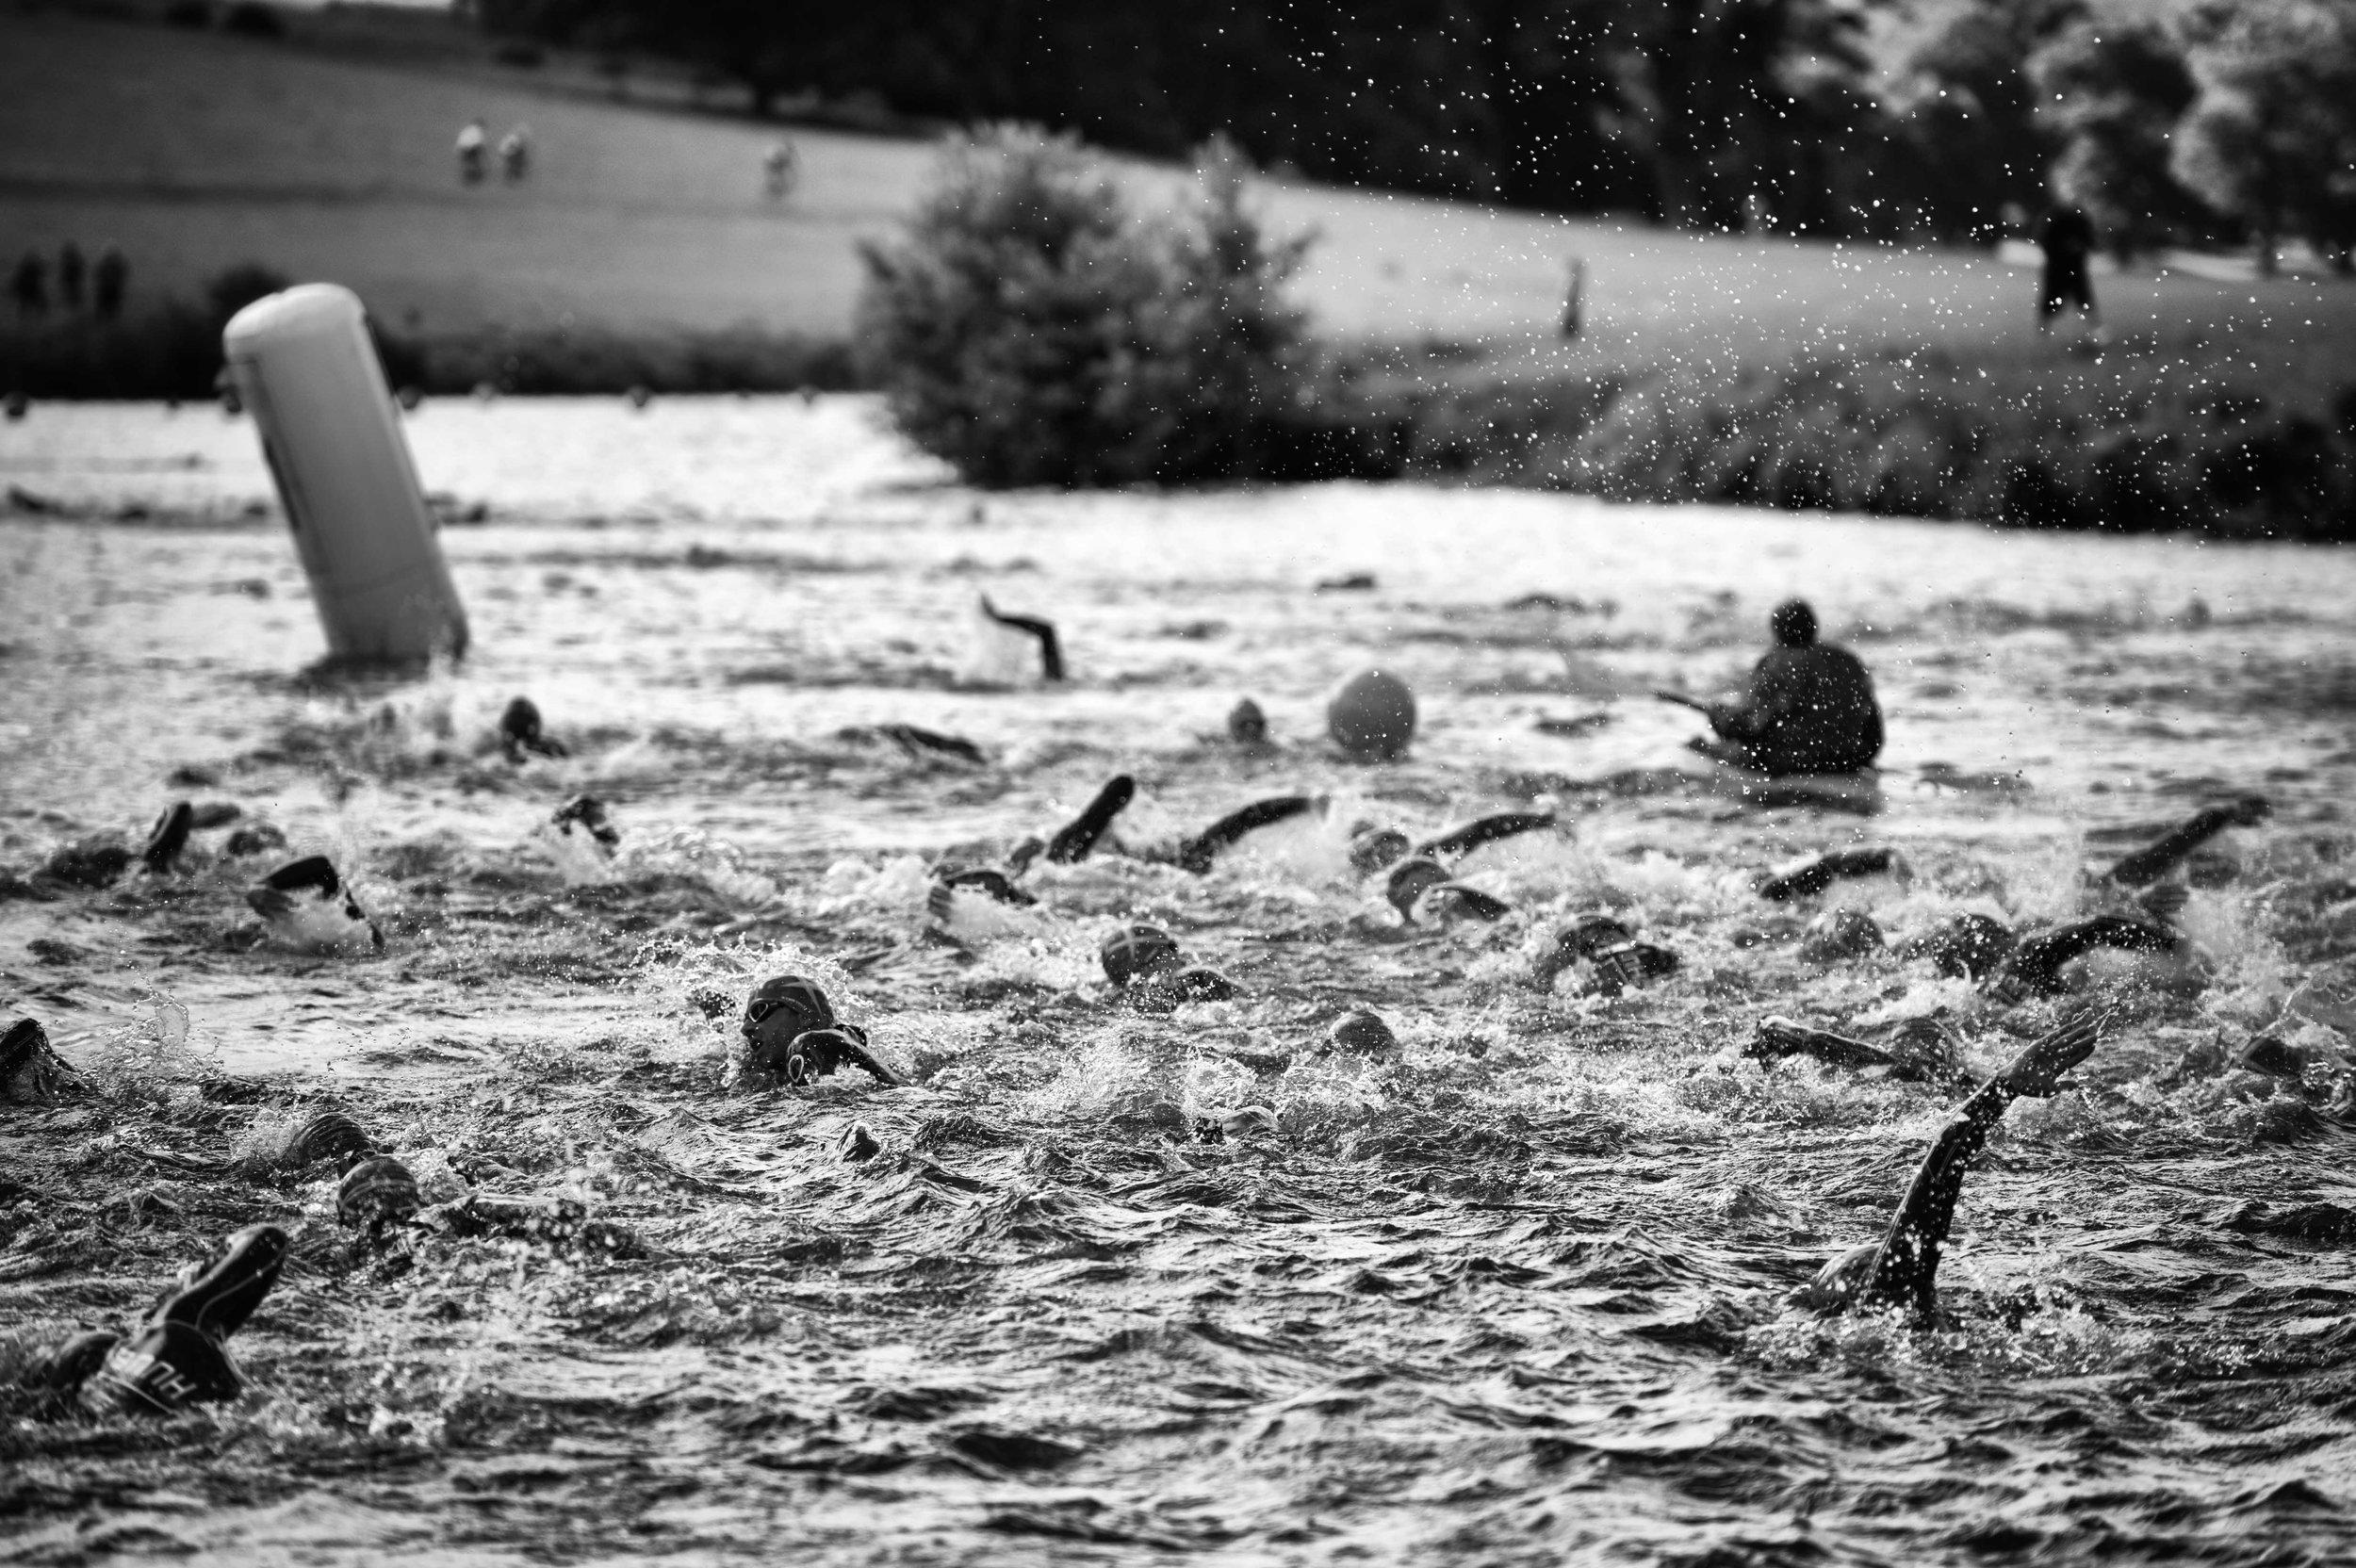 1AT_Golf Photos Aniko Towers Chatsworth triathlon 2016-24.jpg